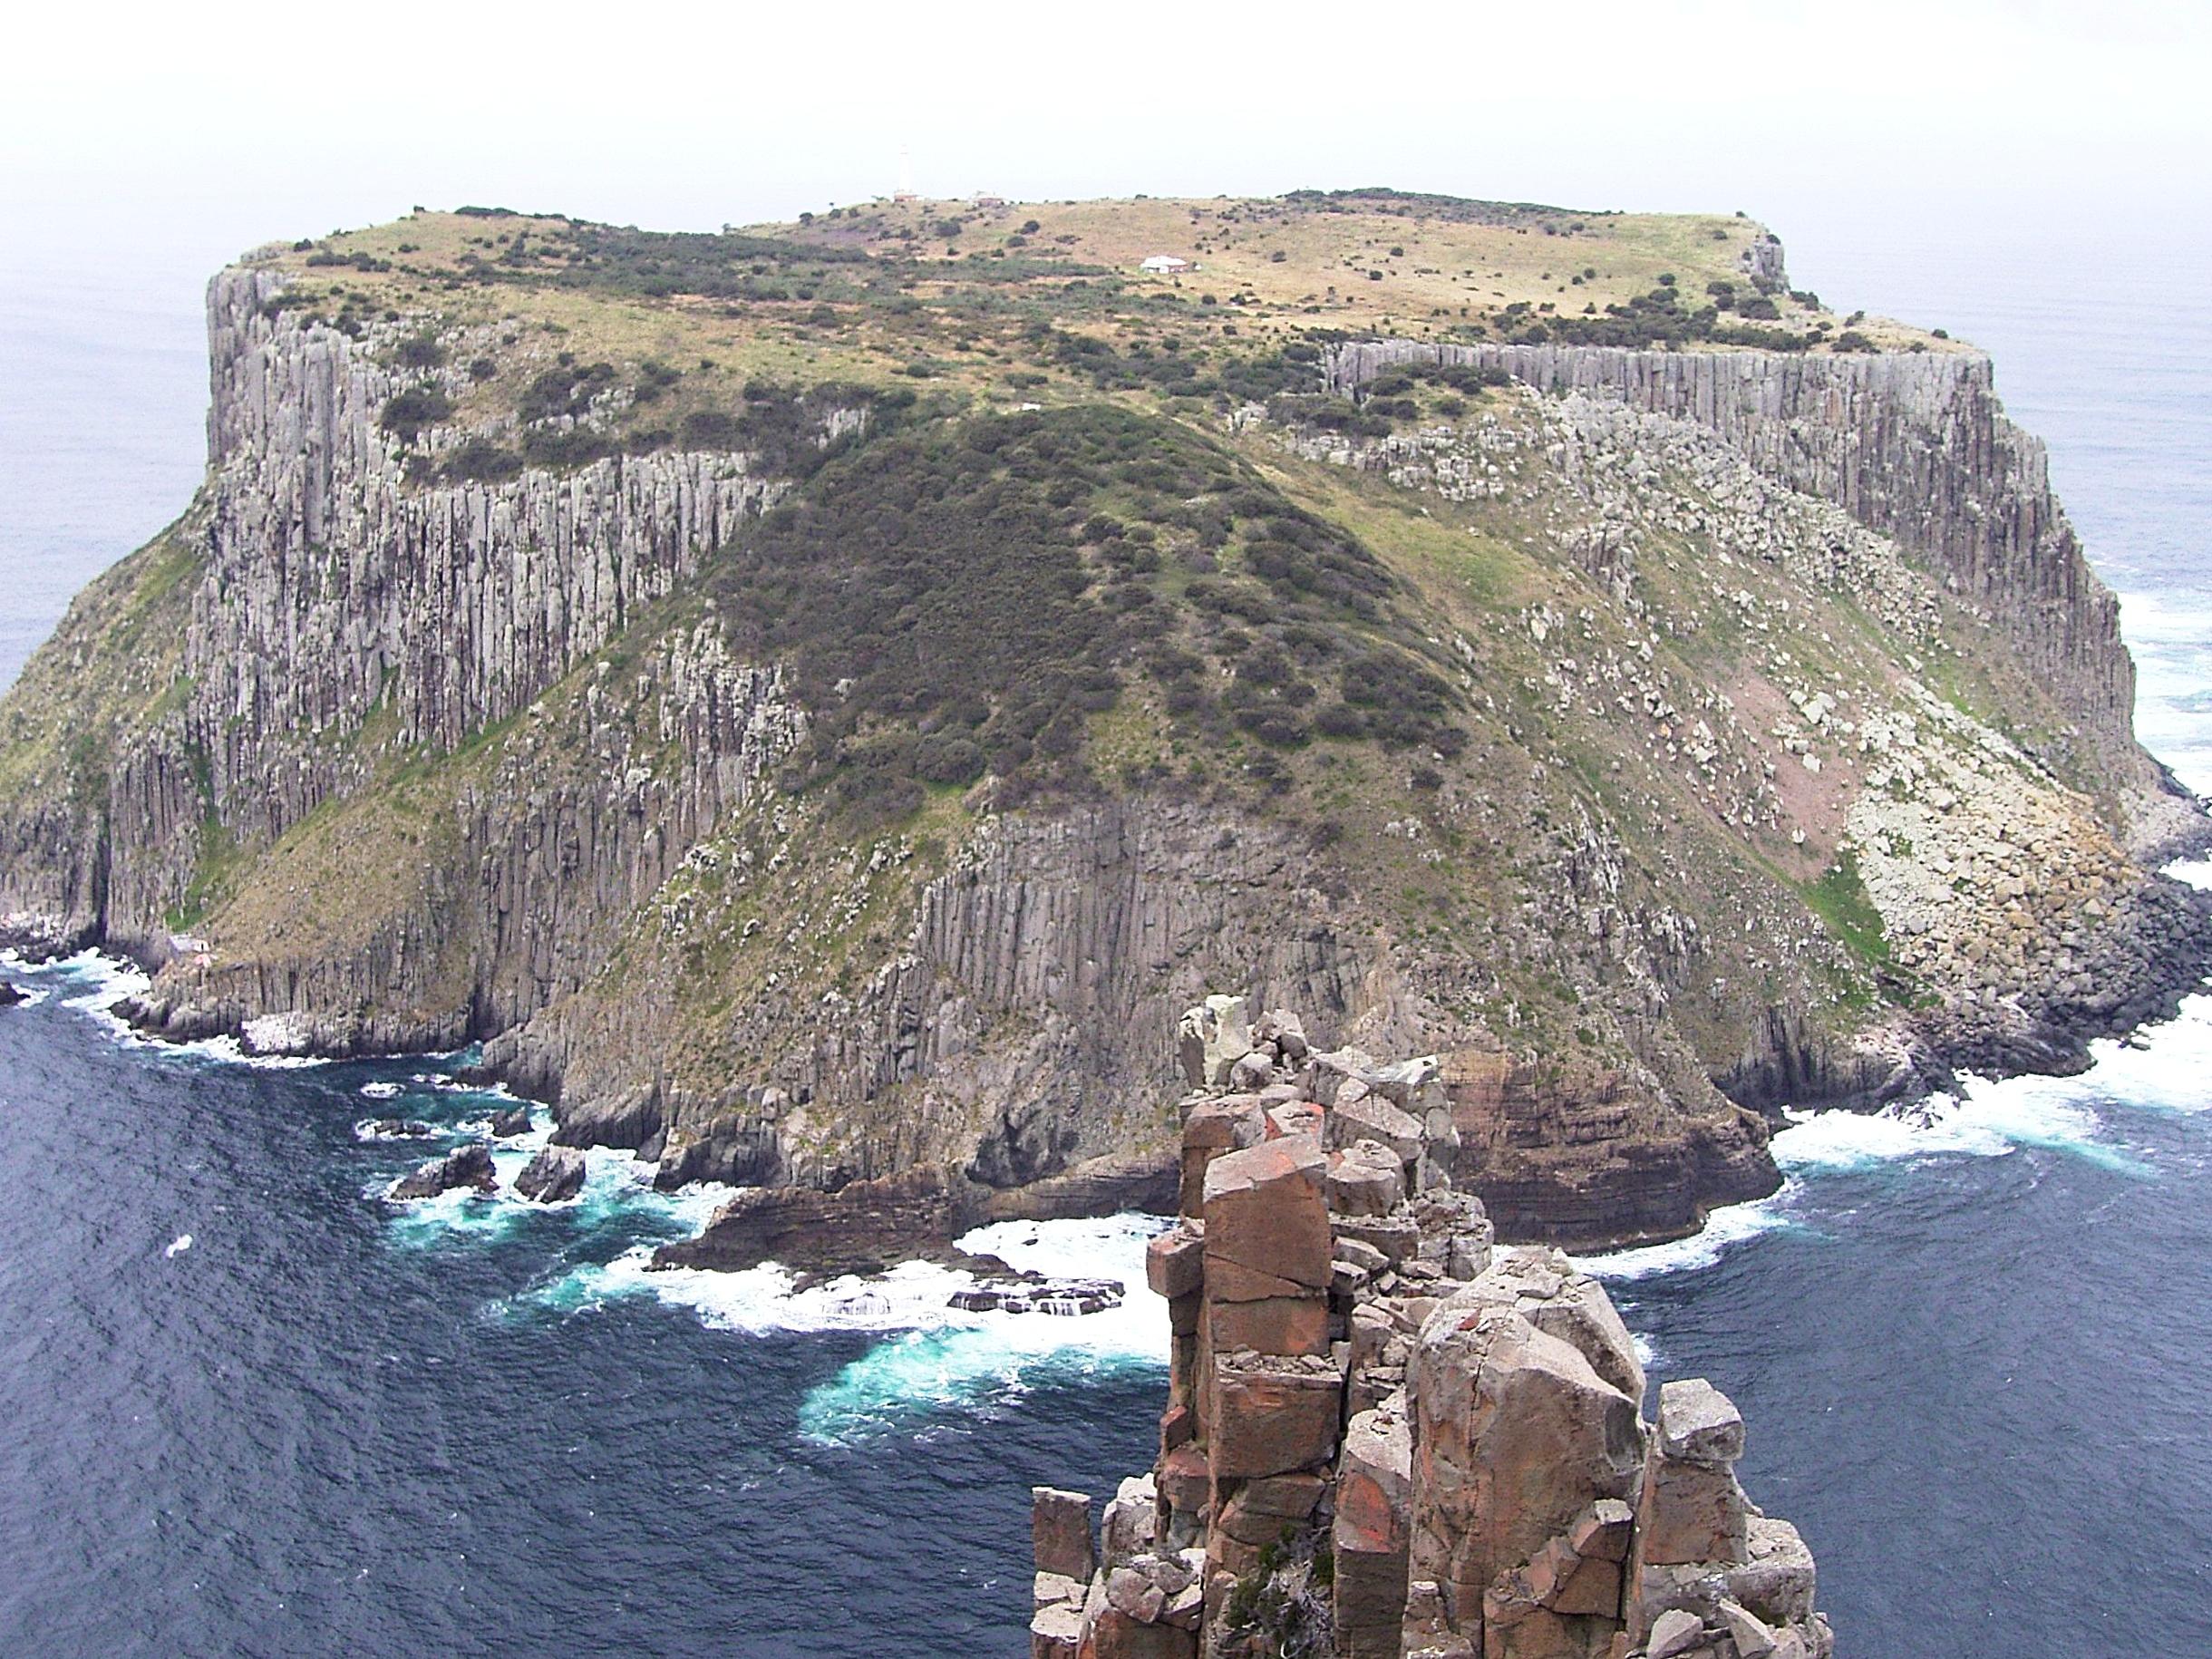 tasman island from cape pillar (shot taken on an earlier trip)